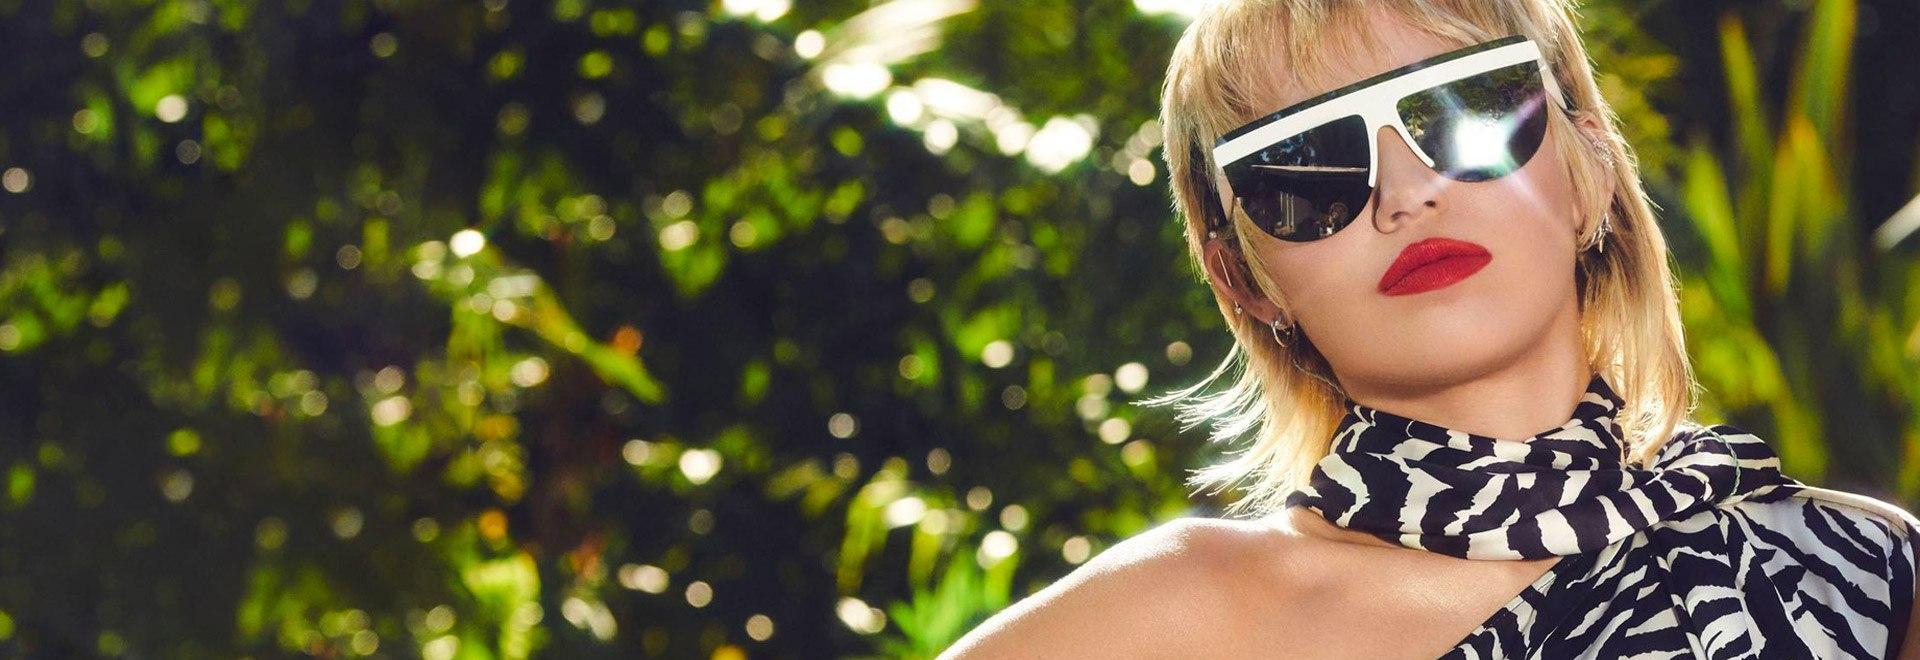 Miley Cyrus Backyard Session Unplugged